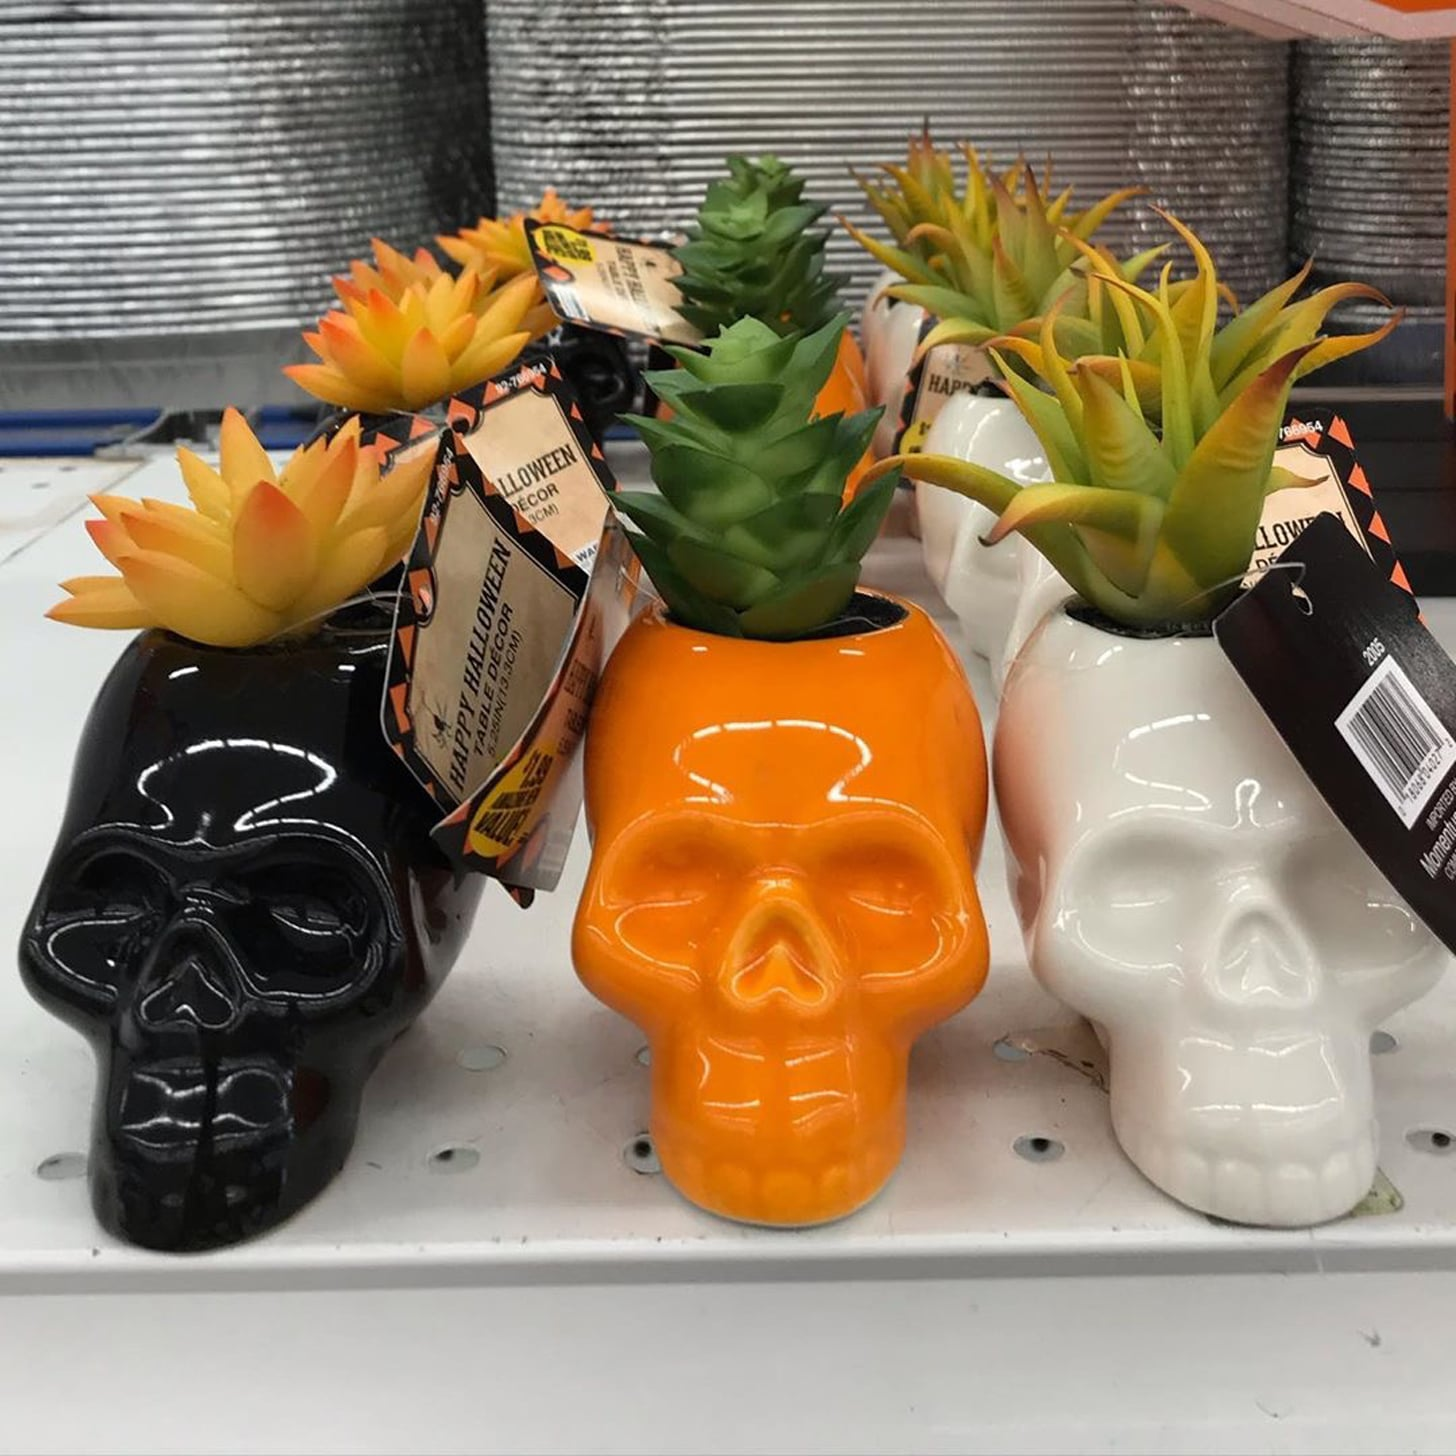 Dollar Store Halloween Decorations 2020 Popsugar Smart Living